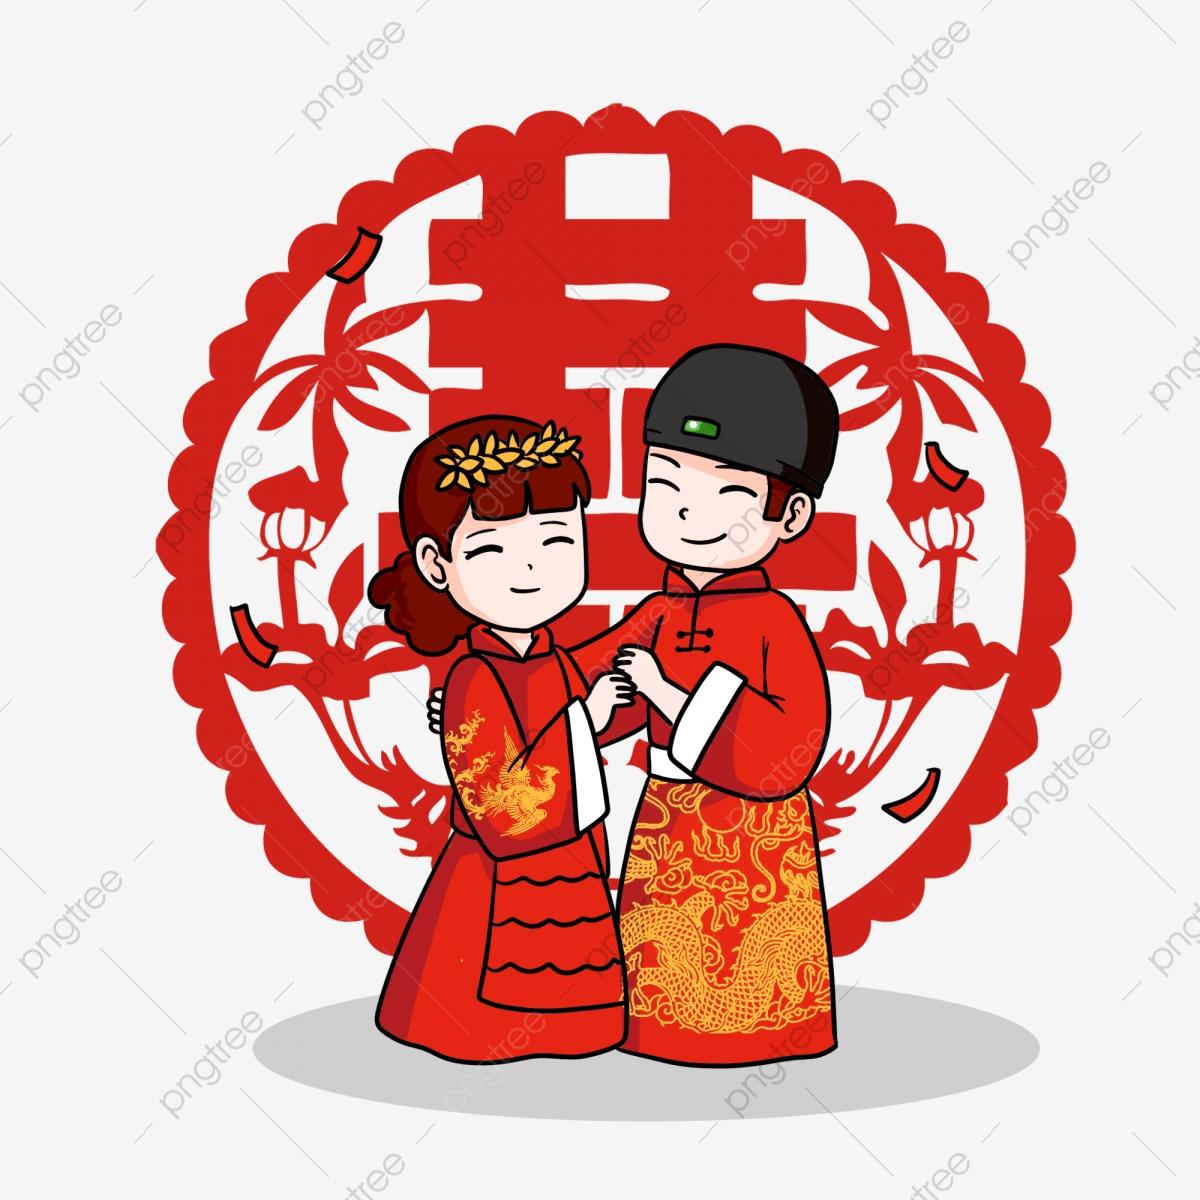 Chinese Wedding Ancient Wedding Cartoon Wedding Lovely.